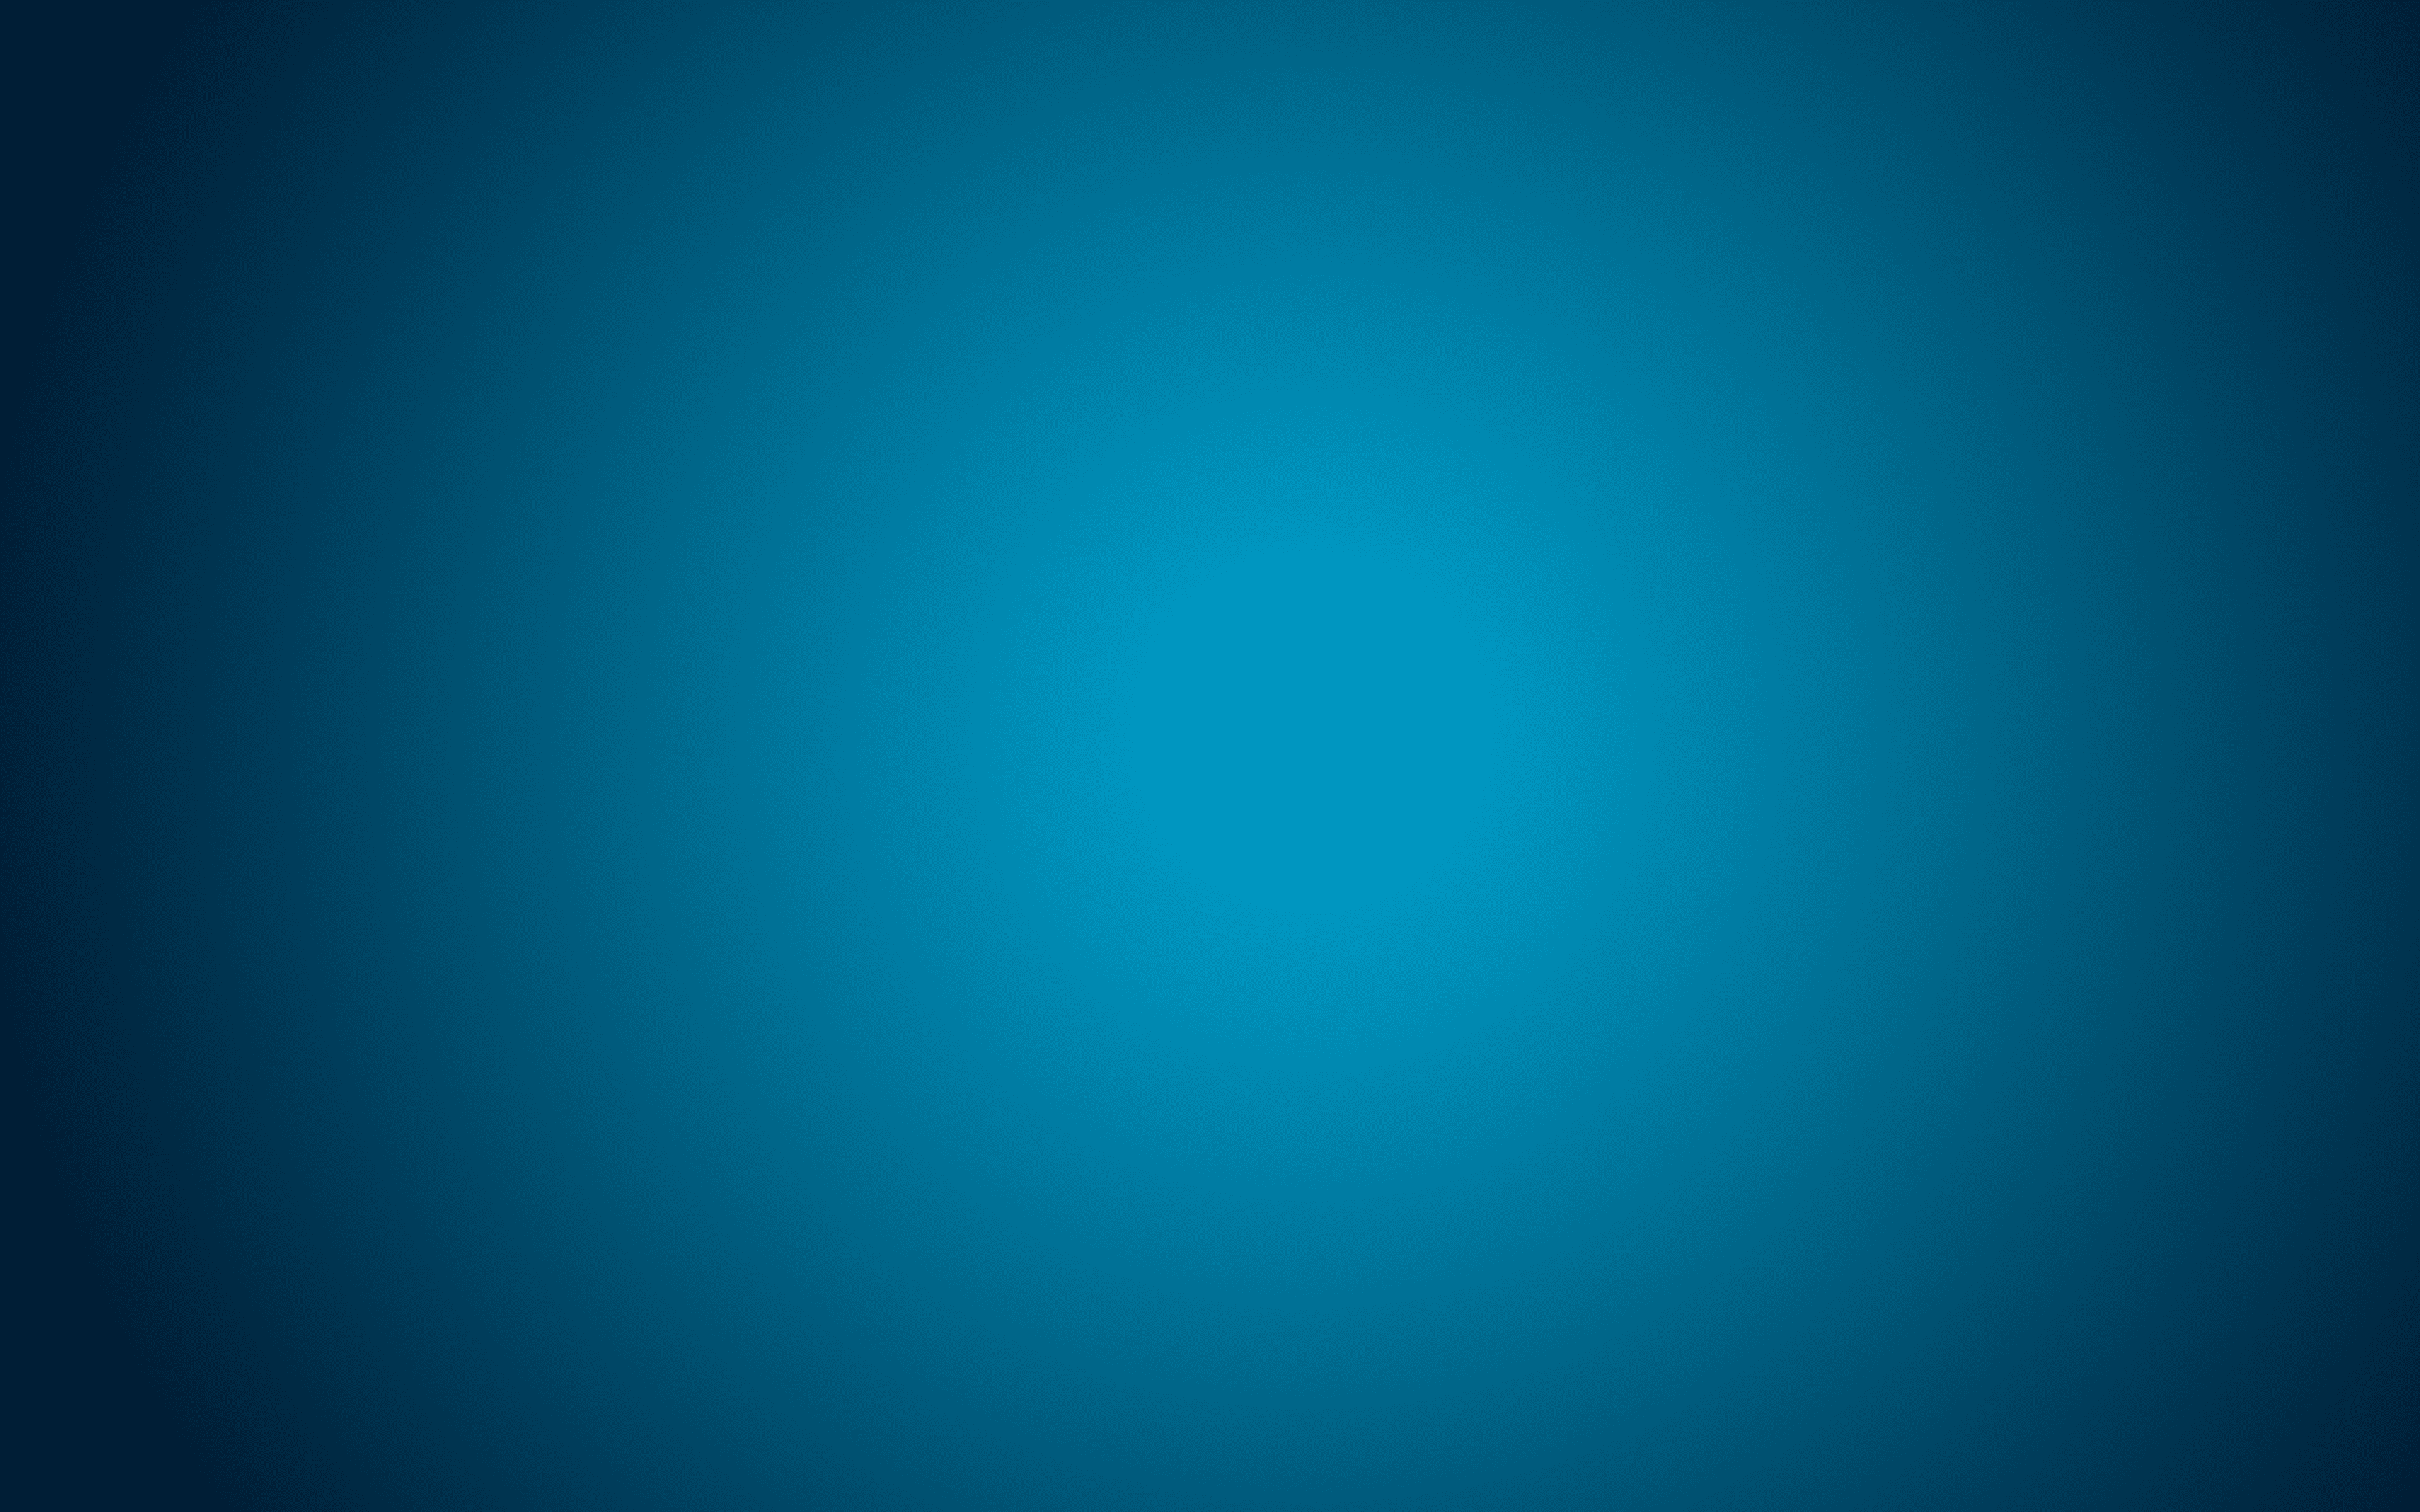 Give Your Desktop Some Dota Love Dota 2 Wallpaper Icons